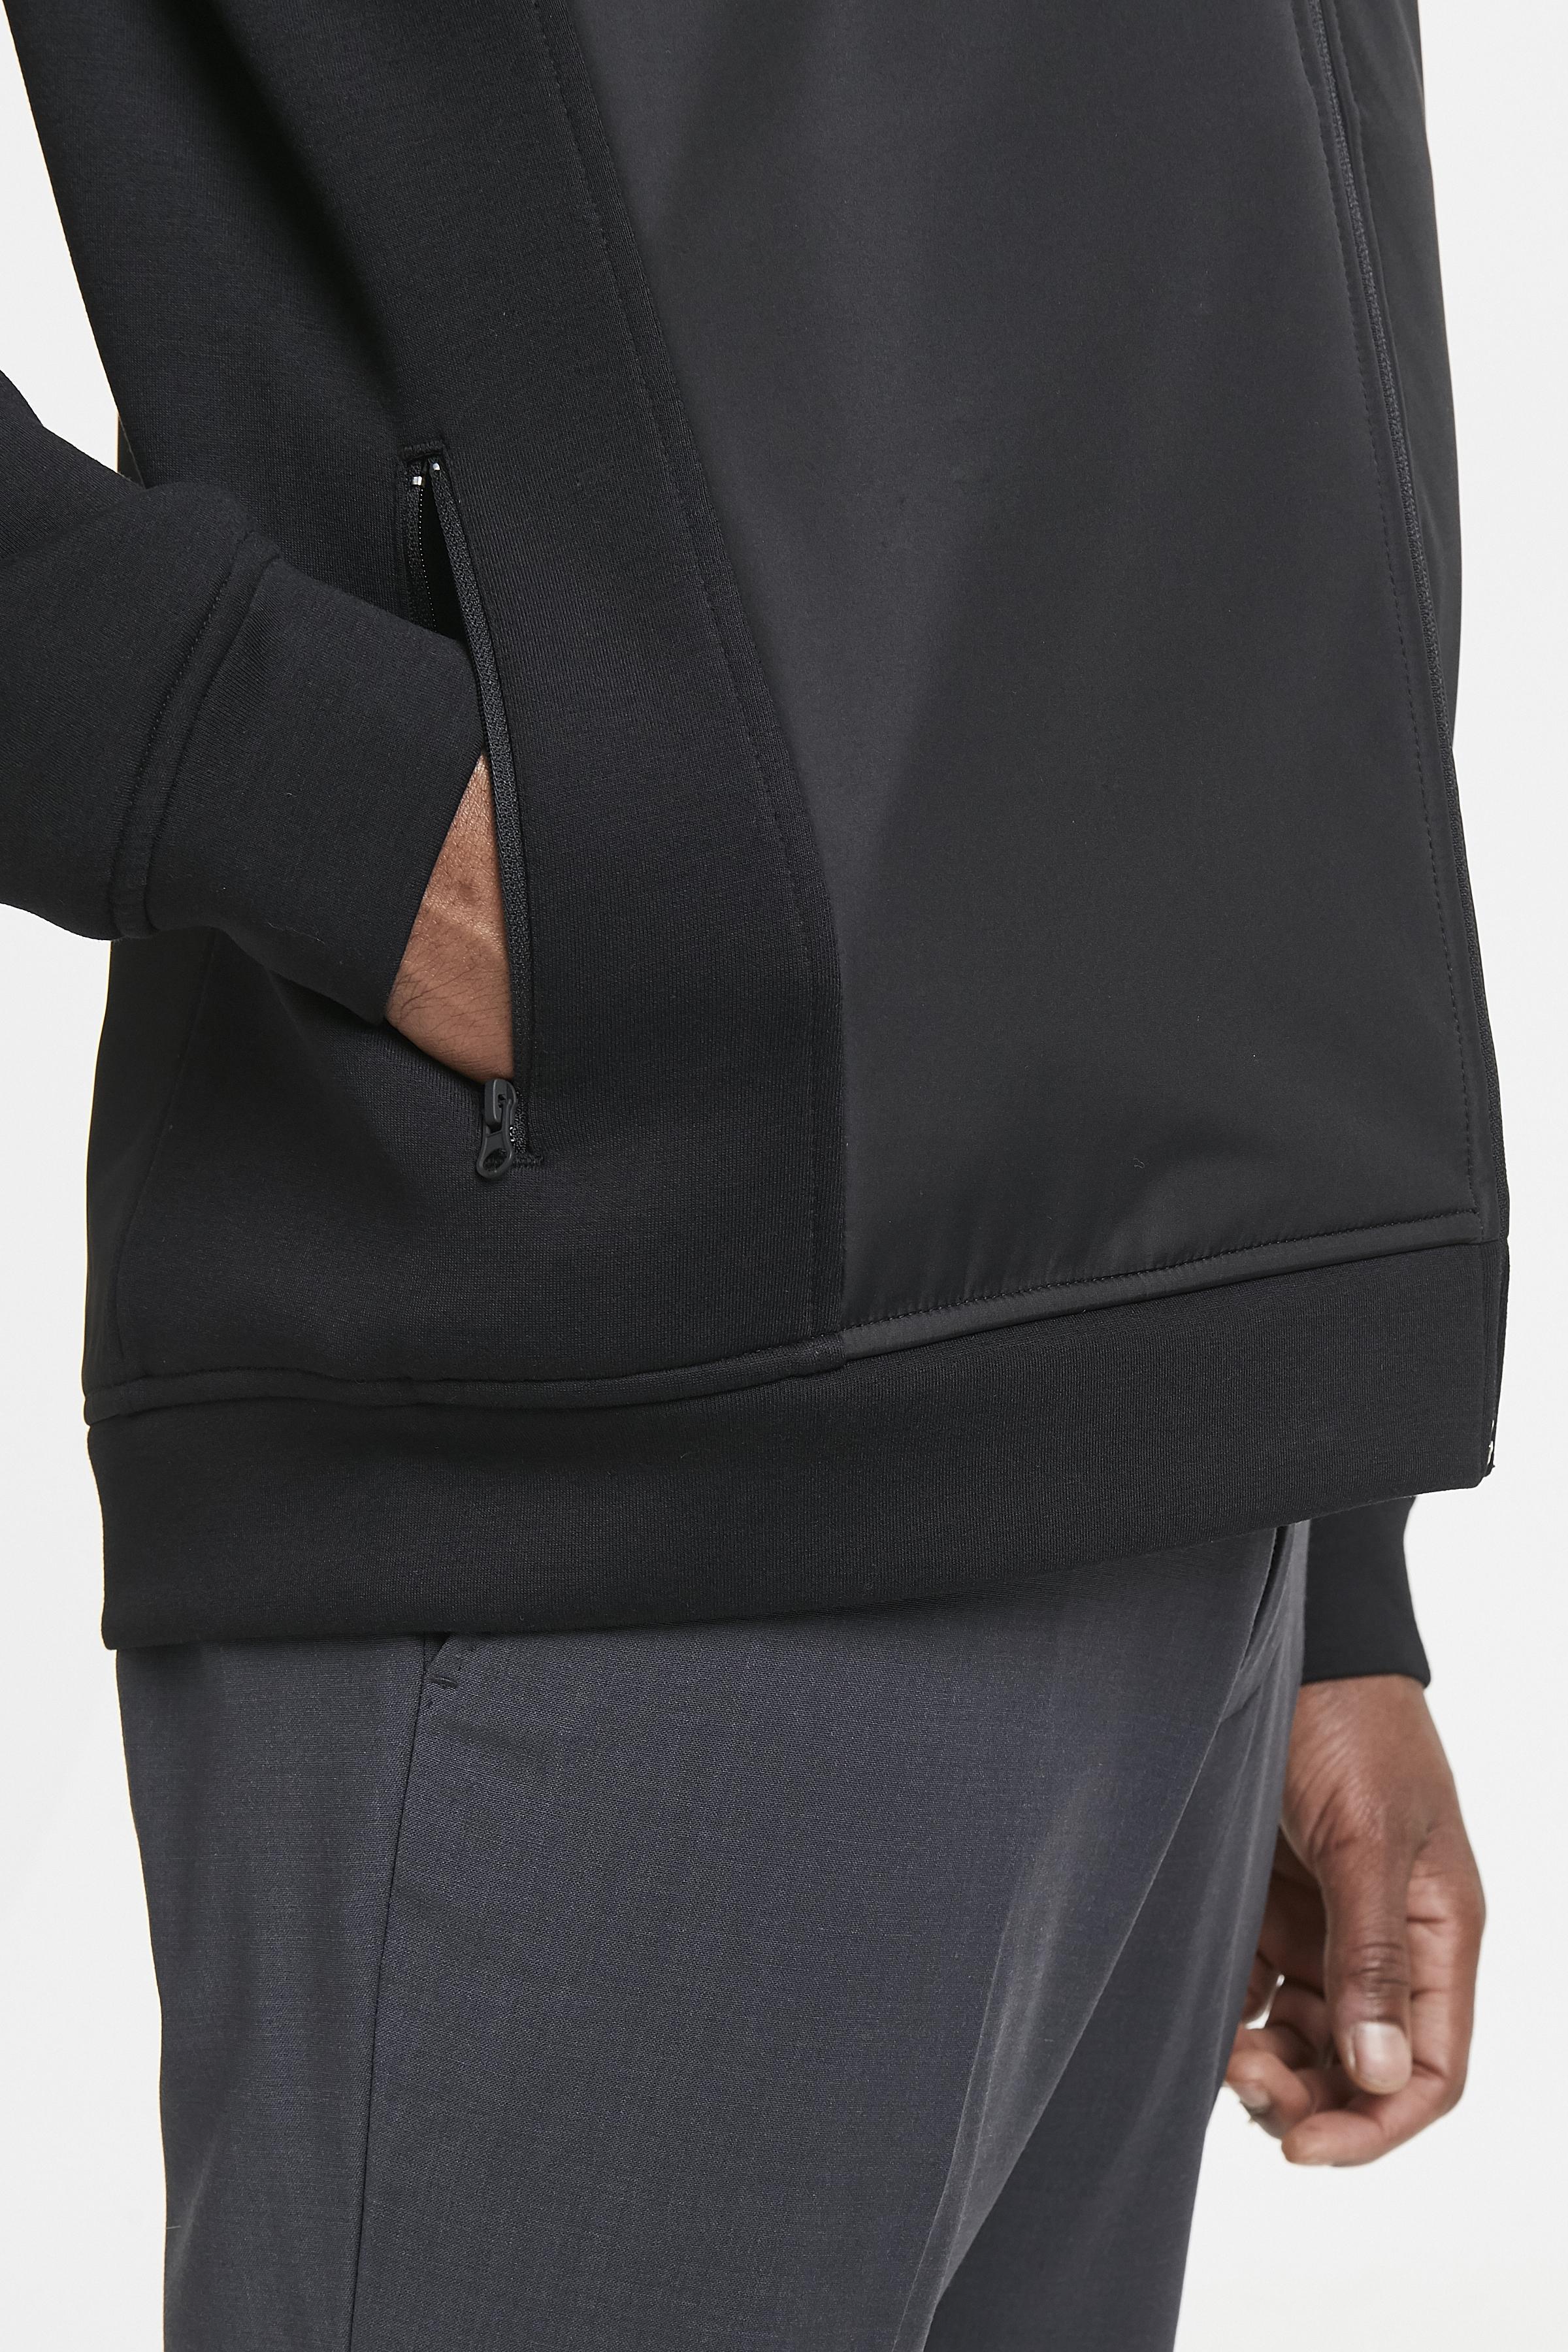 Black Kliest Jacket – Køb Black Kliest Jacket fra str. S-XXL her